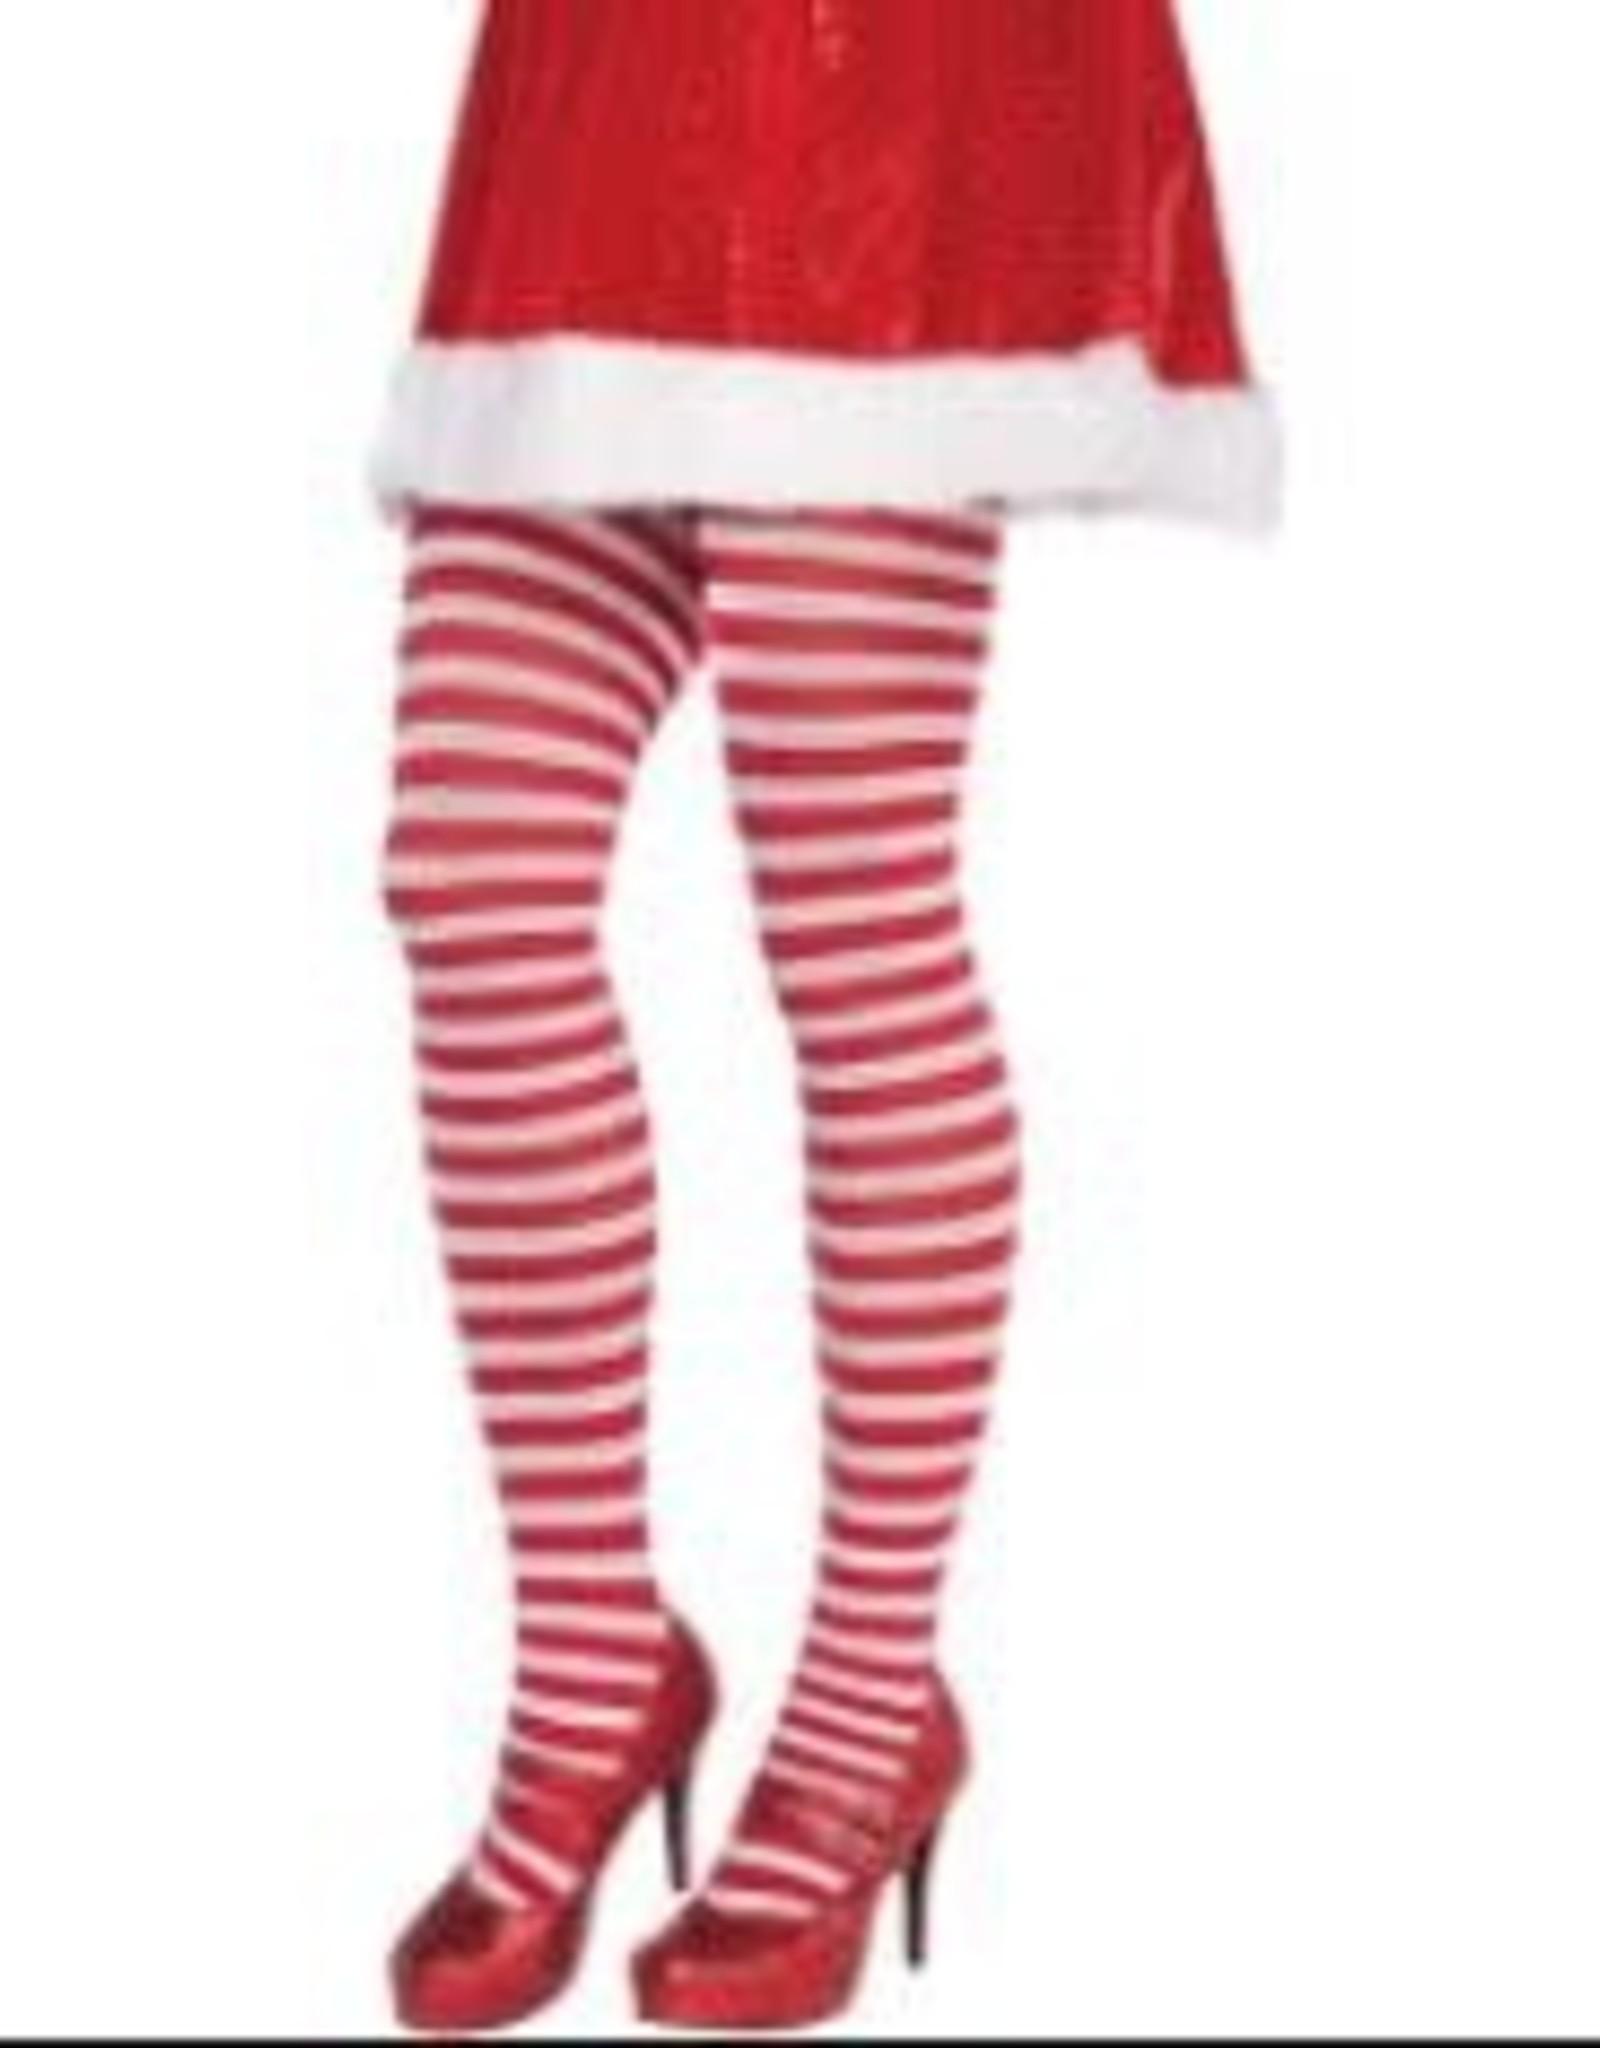 Candy Stripe Child S/M Tights